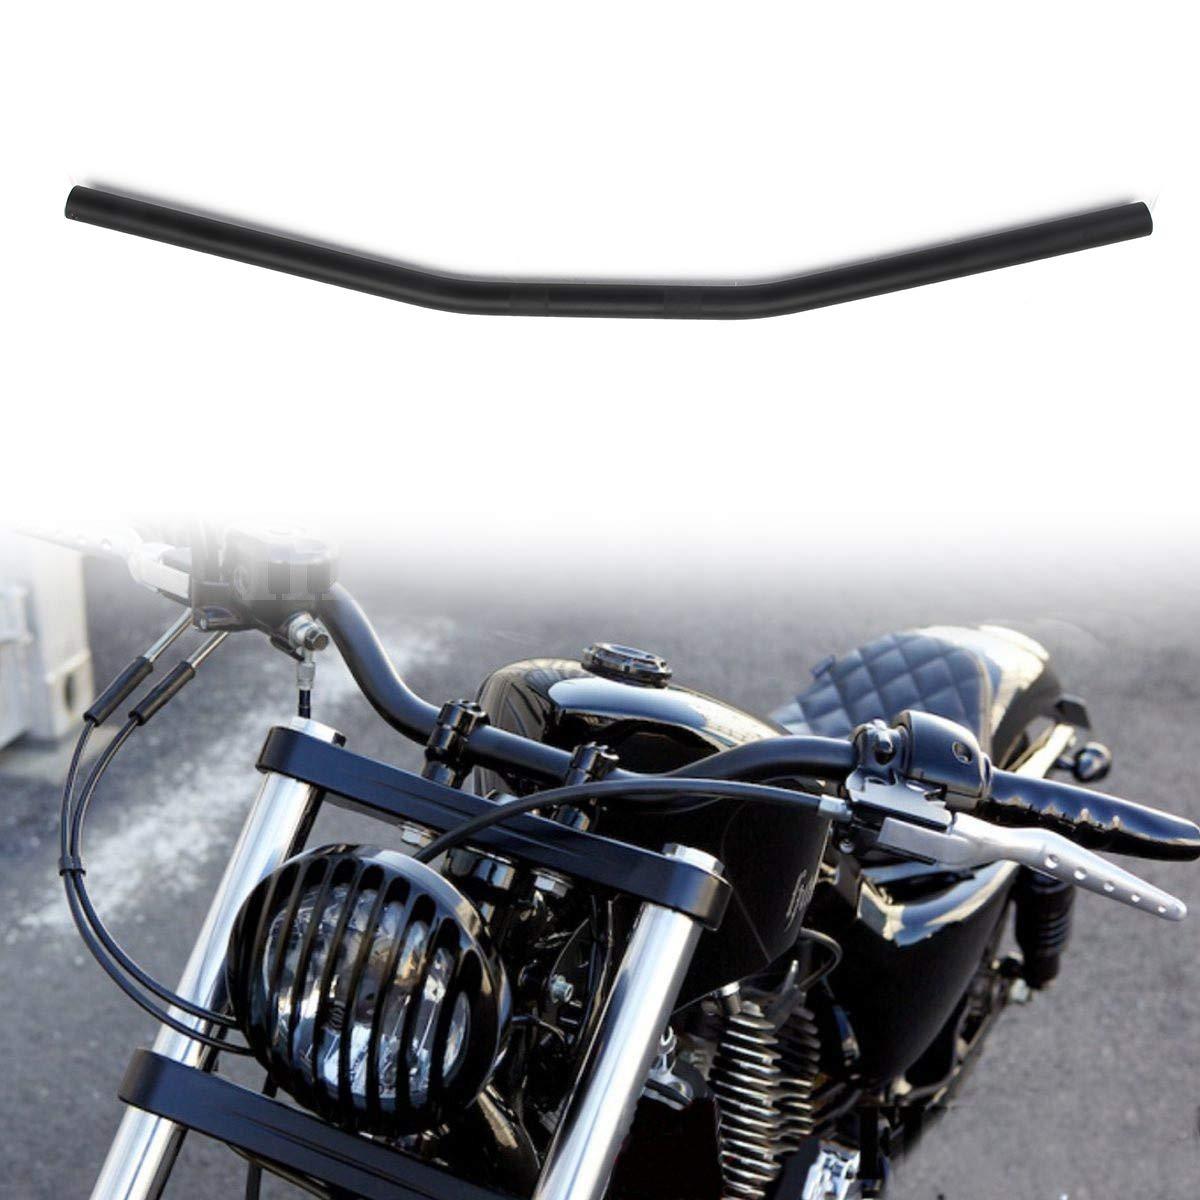 Super Glide FXDI35 49mm Fork Bracket Gauntlet Headlight Fairing Black Trigger Lock Mount Kit For Harley Dyna Super Glide FXD FXDC Low Rider FXDL Street Bob FXDB 35th Ann